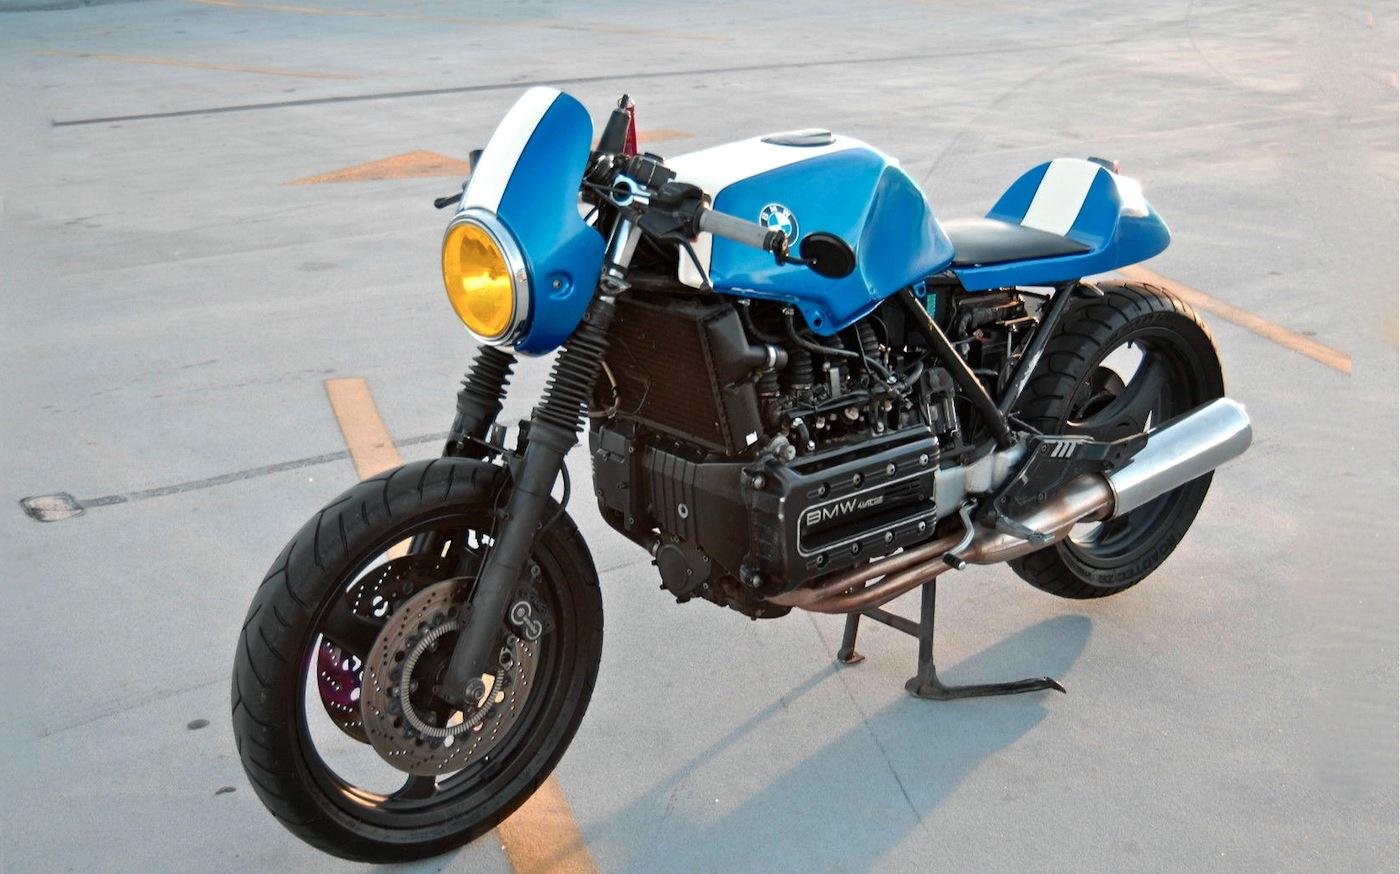 The Blue Key Inazuma Caf 233 Racer